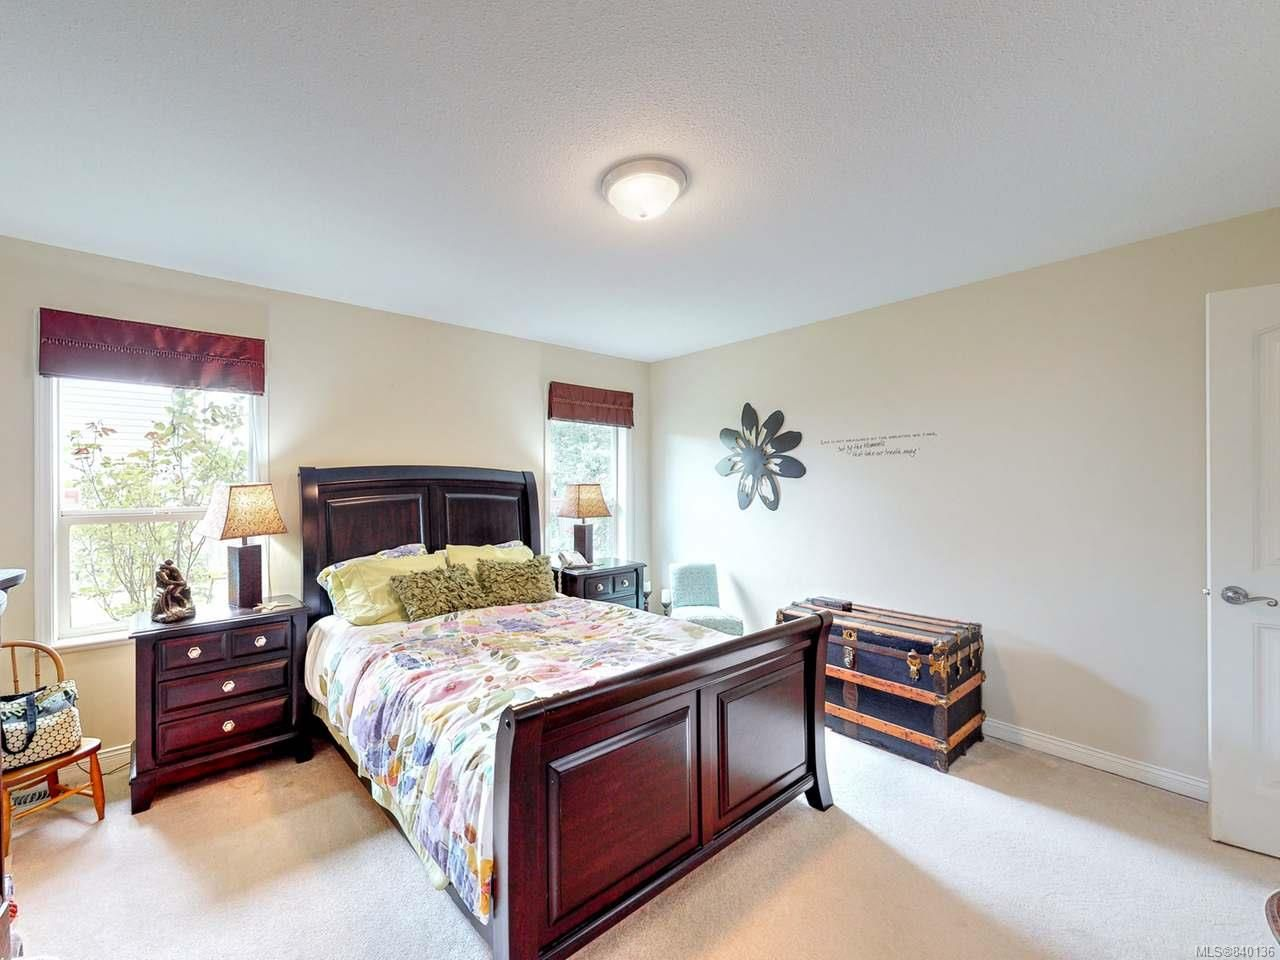 Photo 16: Photos: 5484 W Woodland Cres in PORT ALBERNI: PA Port Alberni House for sale (Port Alberni)  : MLS®# 840136